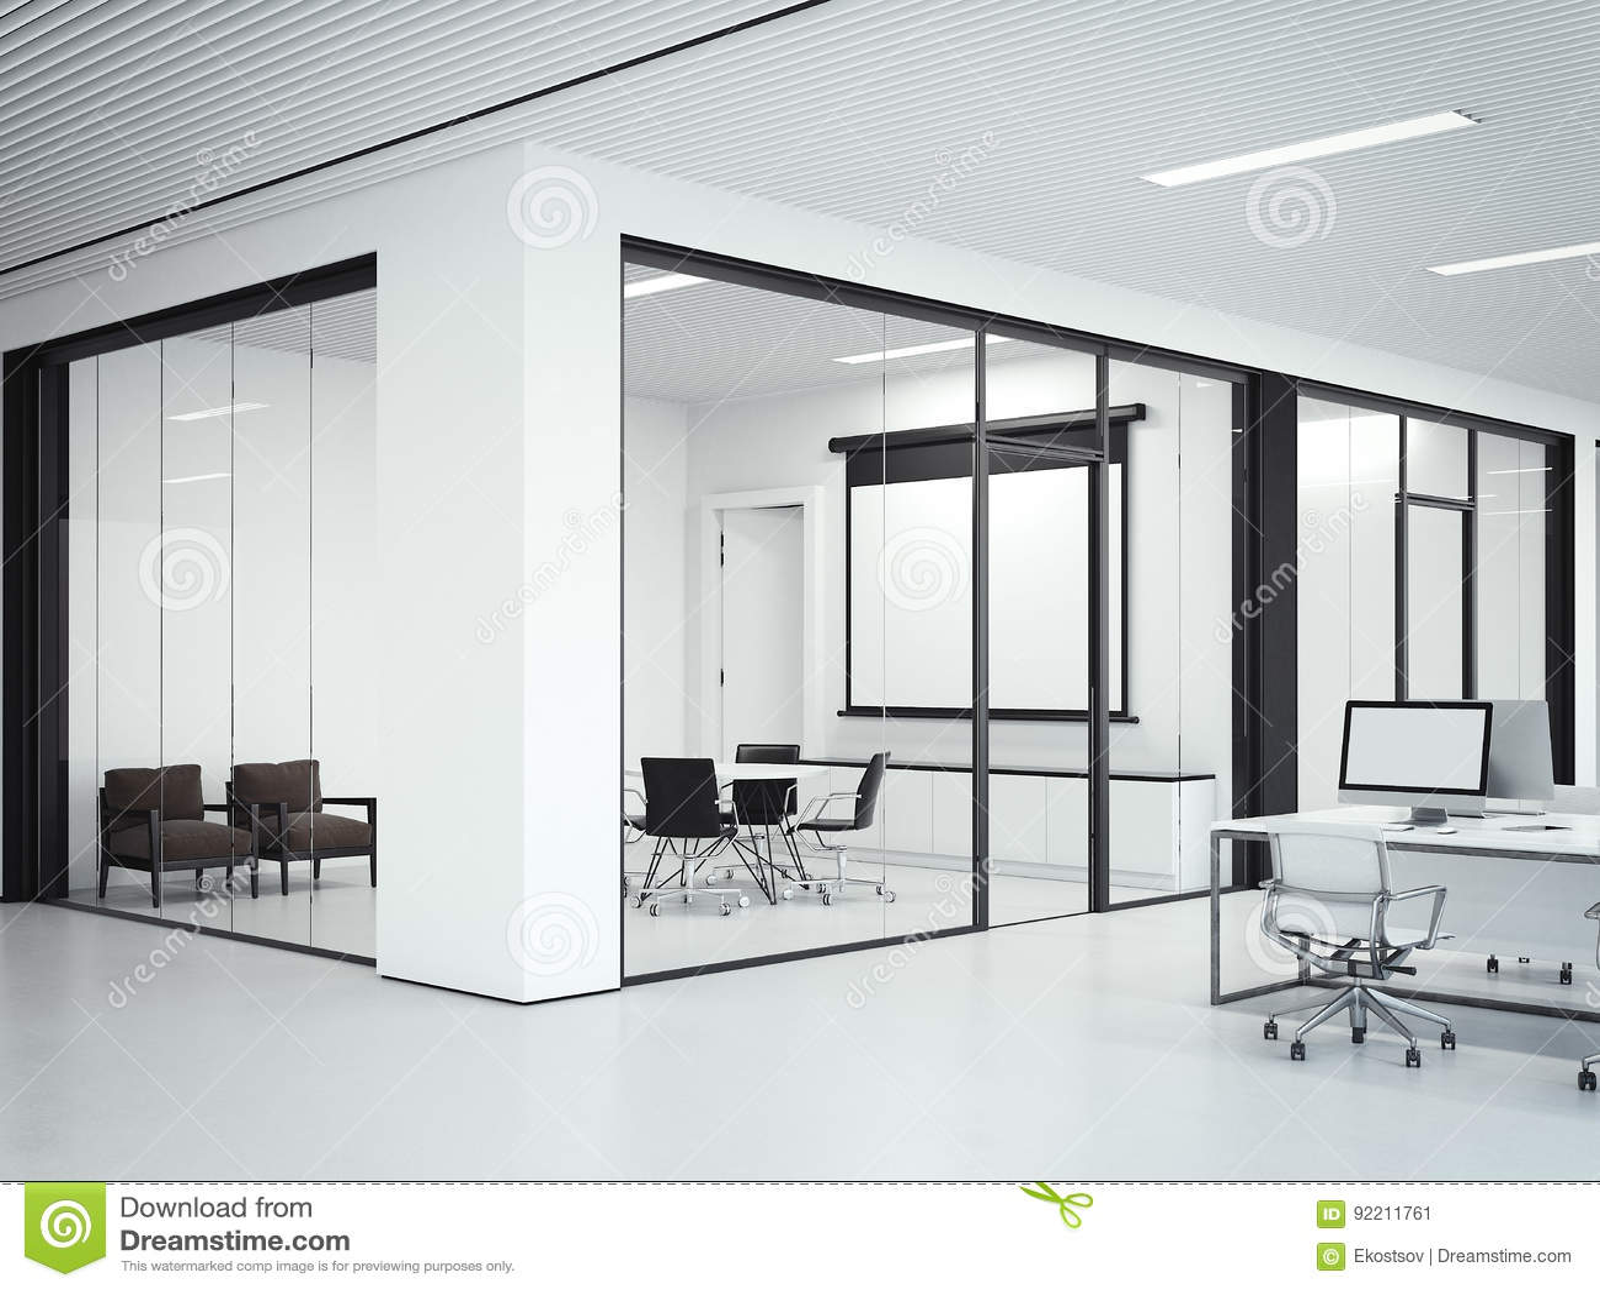 Clear office interior wiht meeting room. 3d rendering